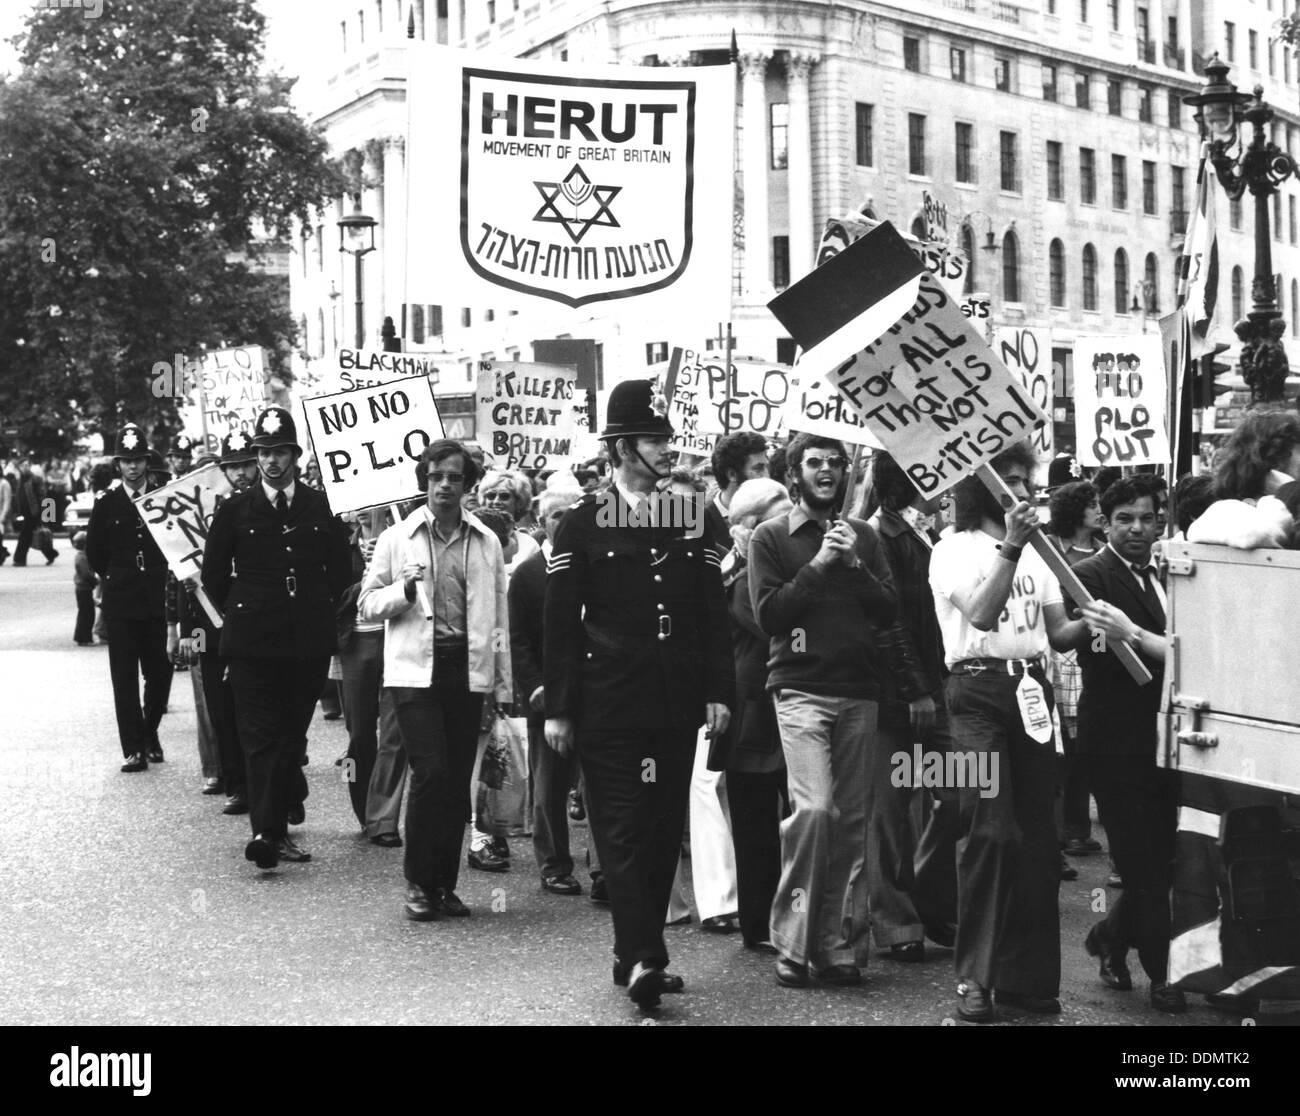 Herut anti-PLO march, Trafalgar Square, London, 24 August 1975. - Stock Image